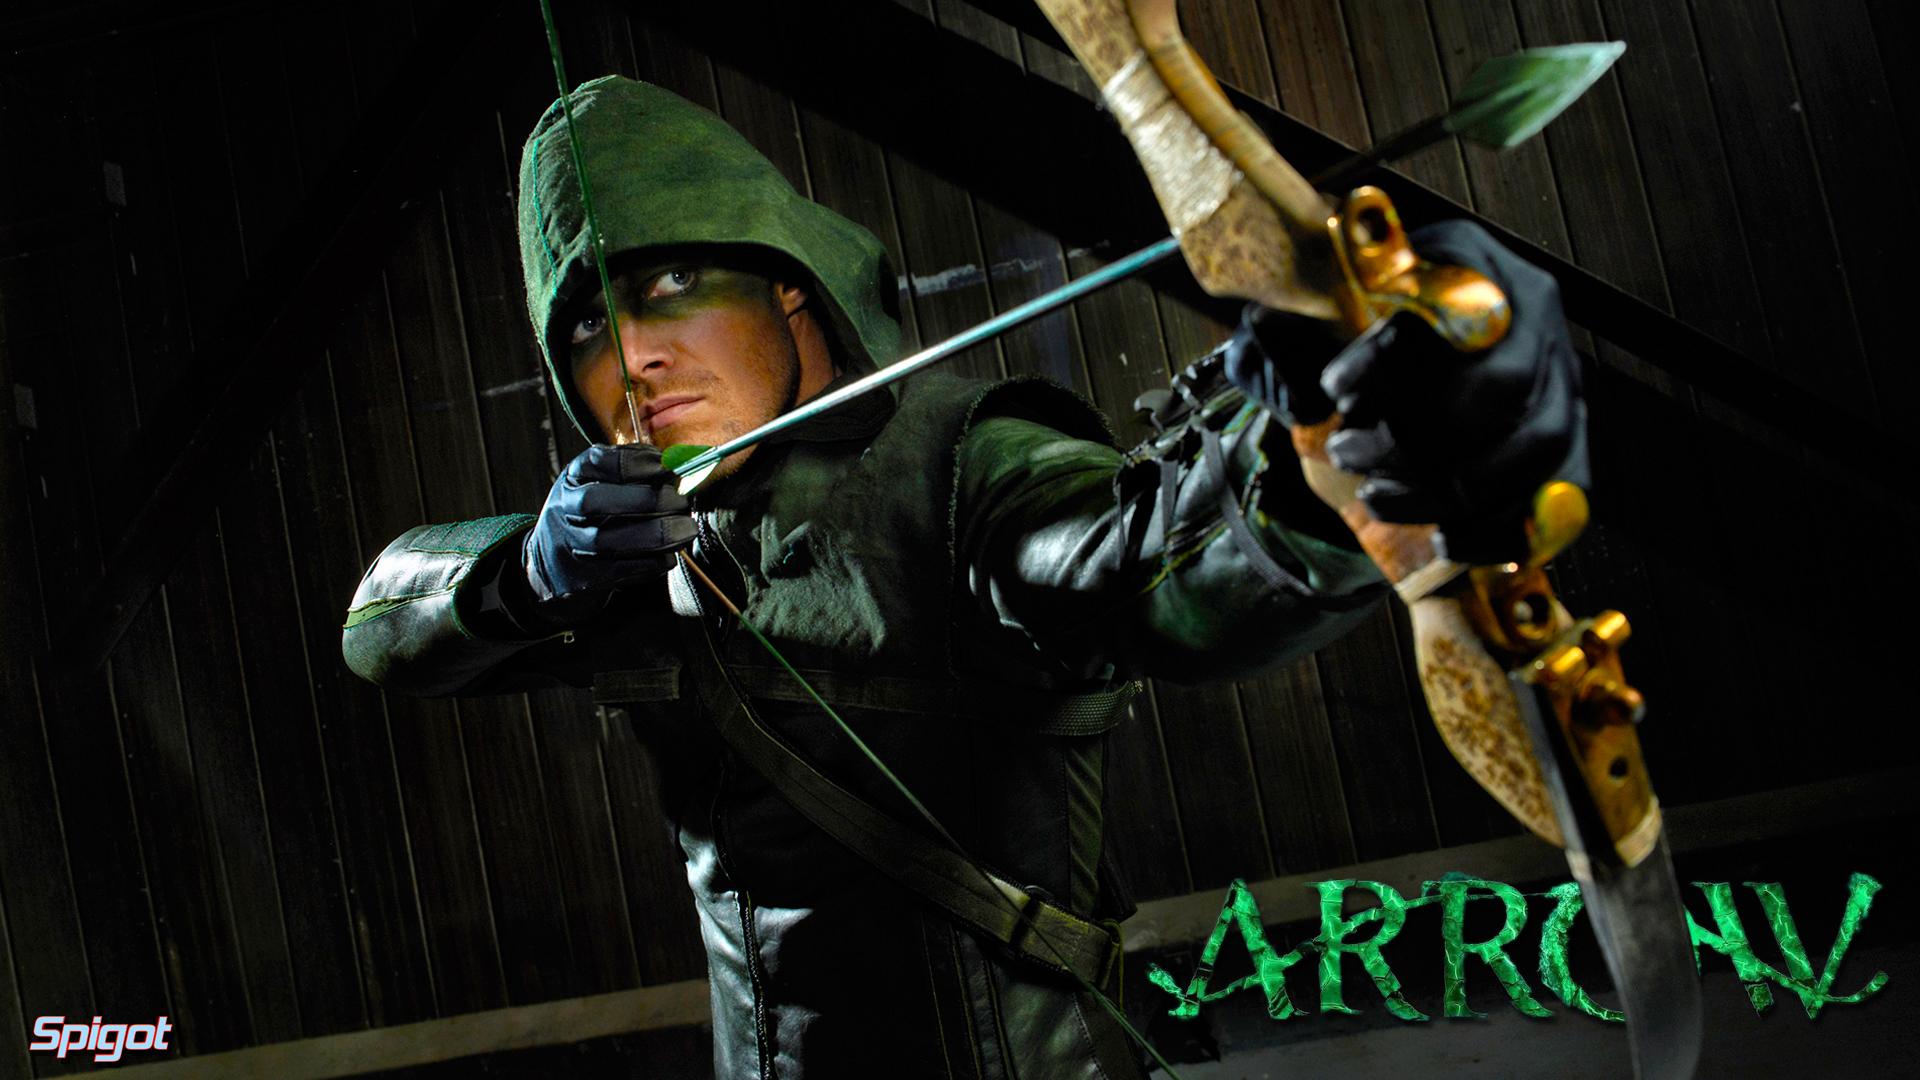 arrow tv series wallpaper 843315